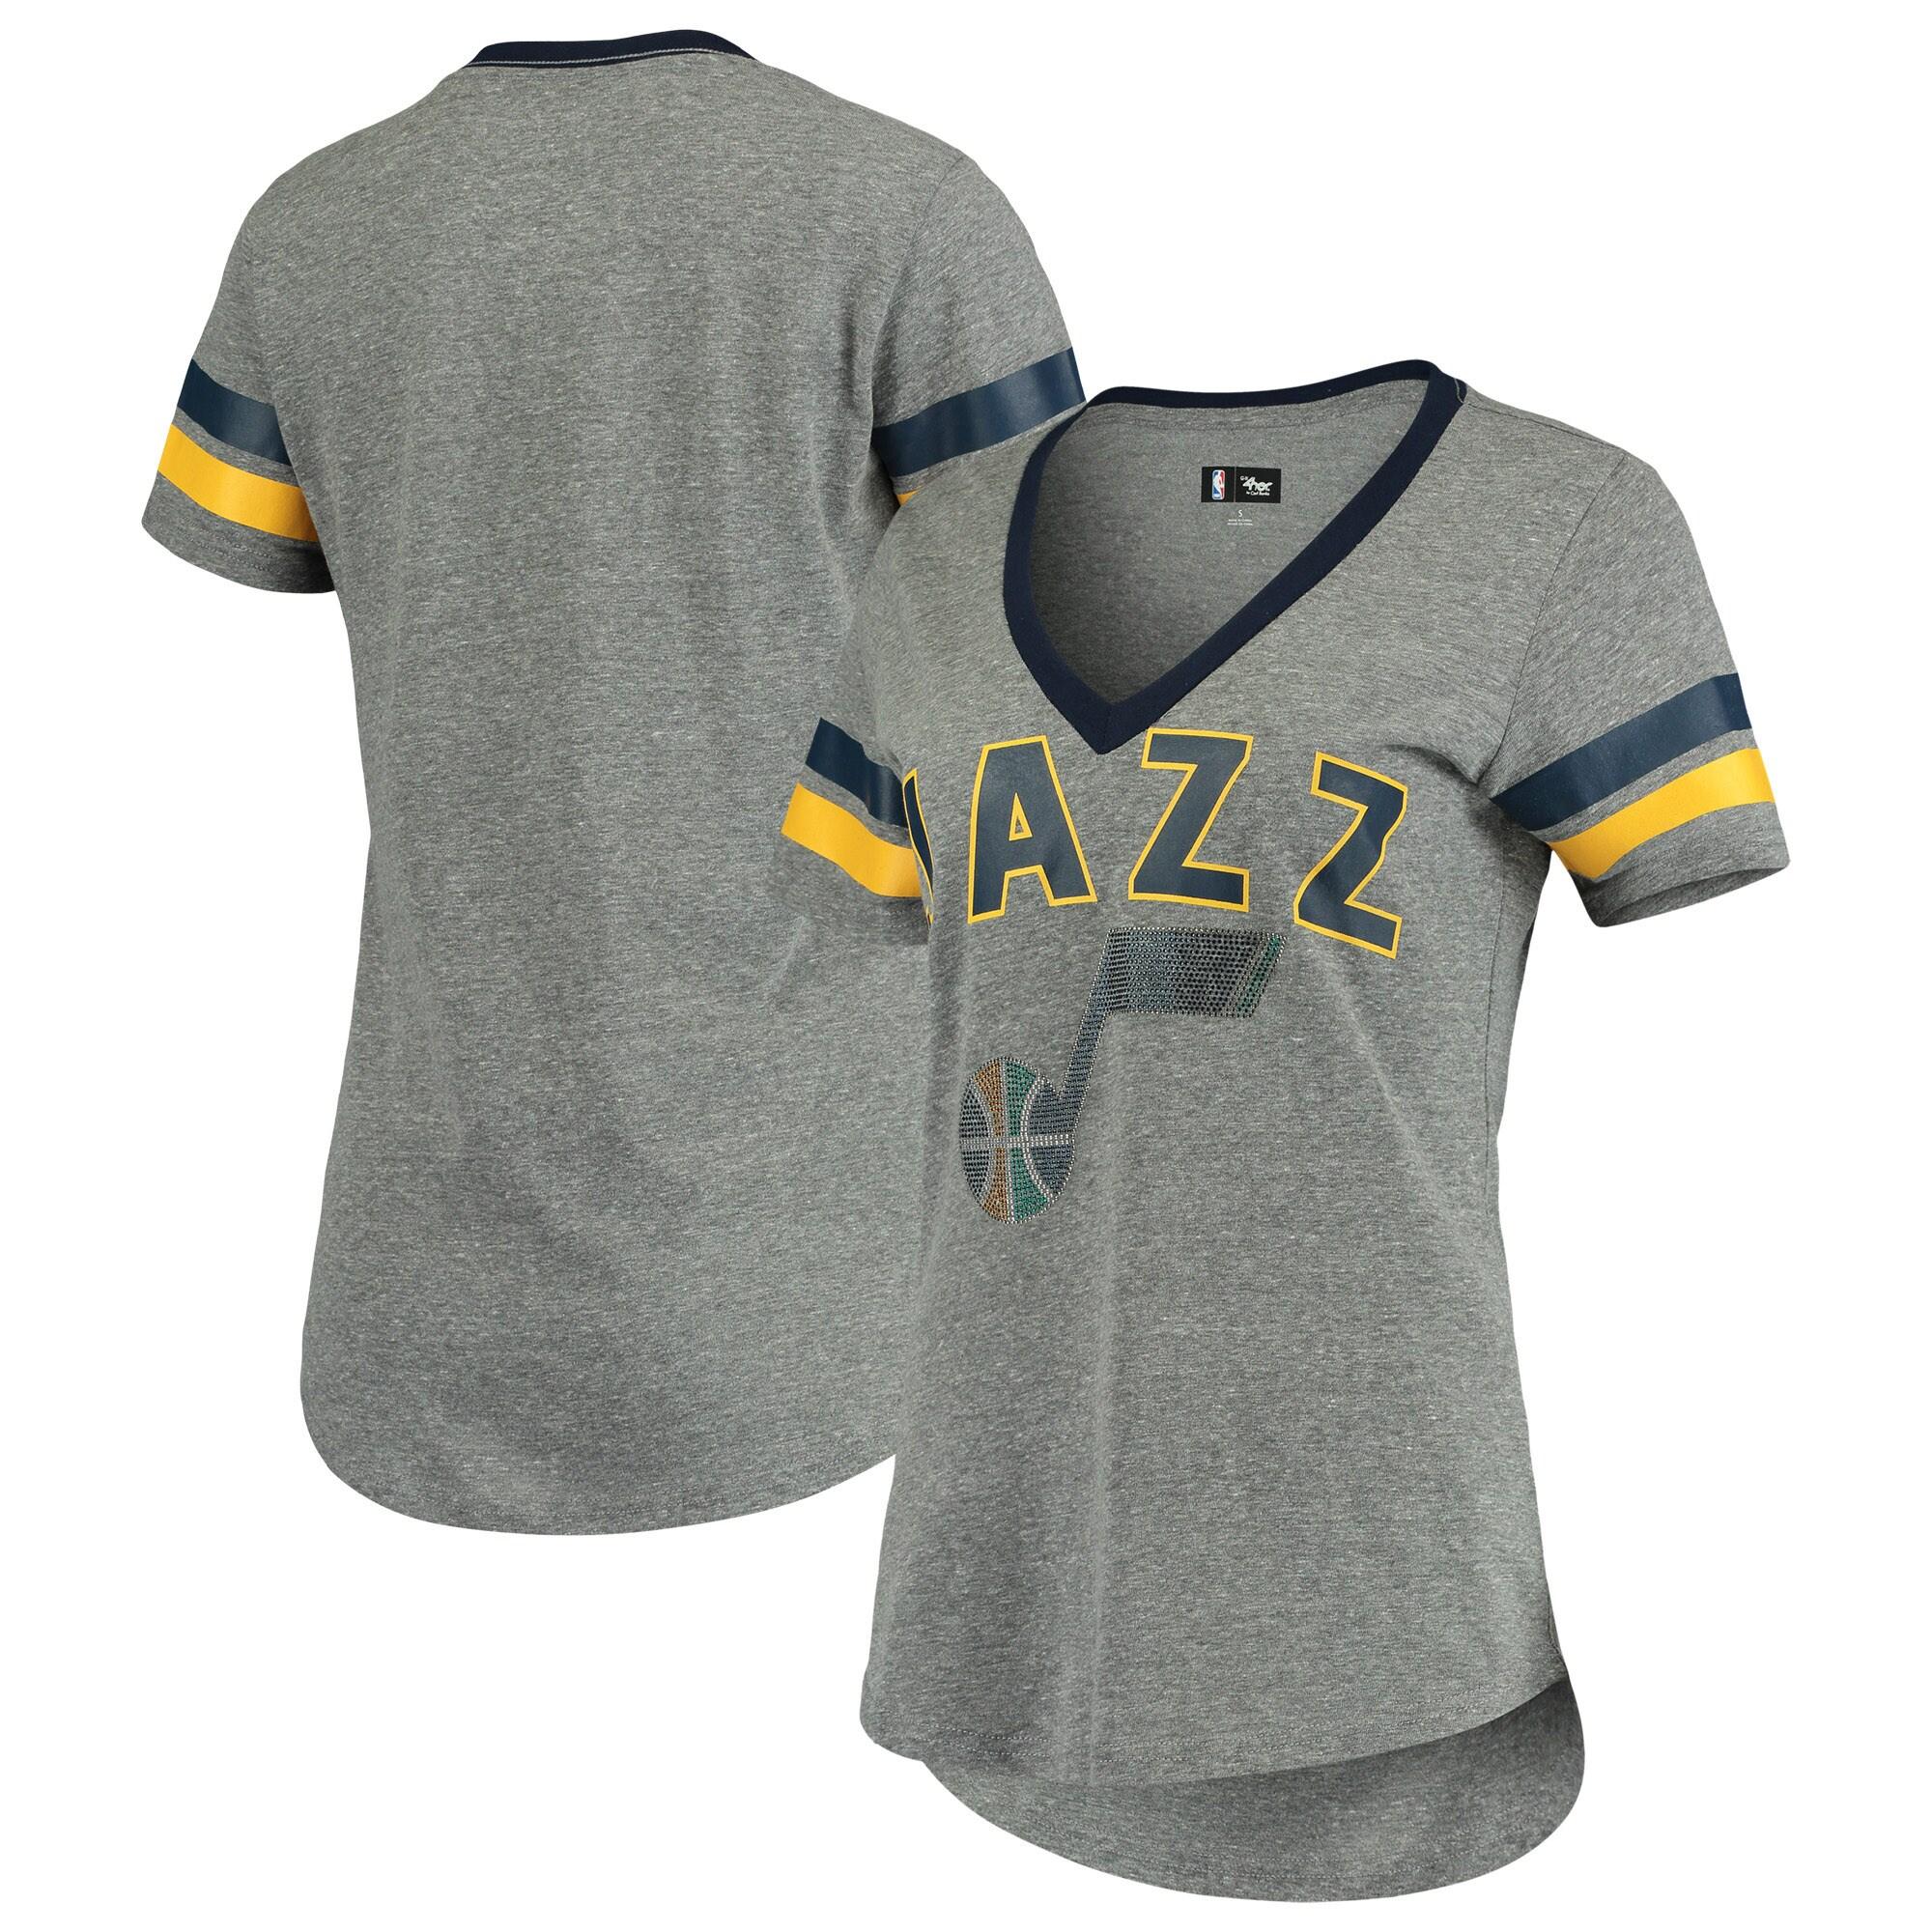 Utah Jazz G-III 4Her by Carl Banks Women's Walk Off Crystal Applique Logo V-Neck Tri-Blend T-Shirt - Gray/Navy